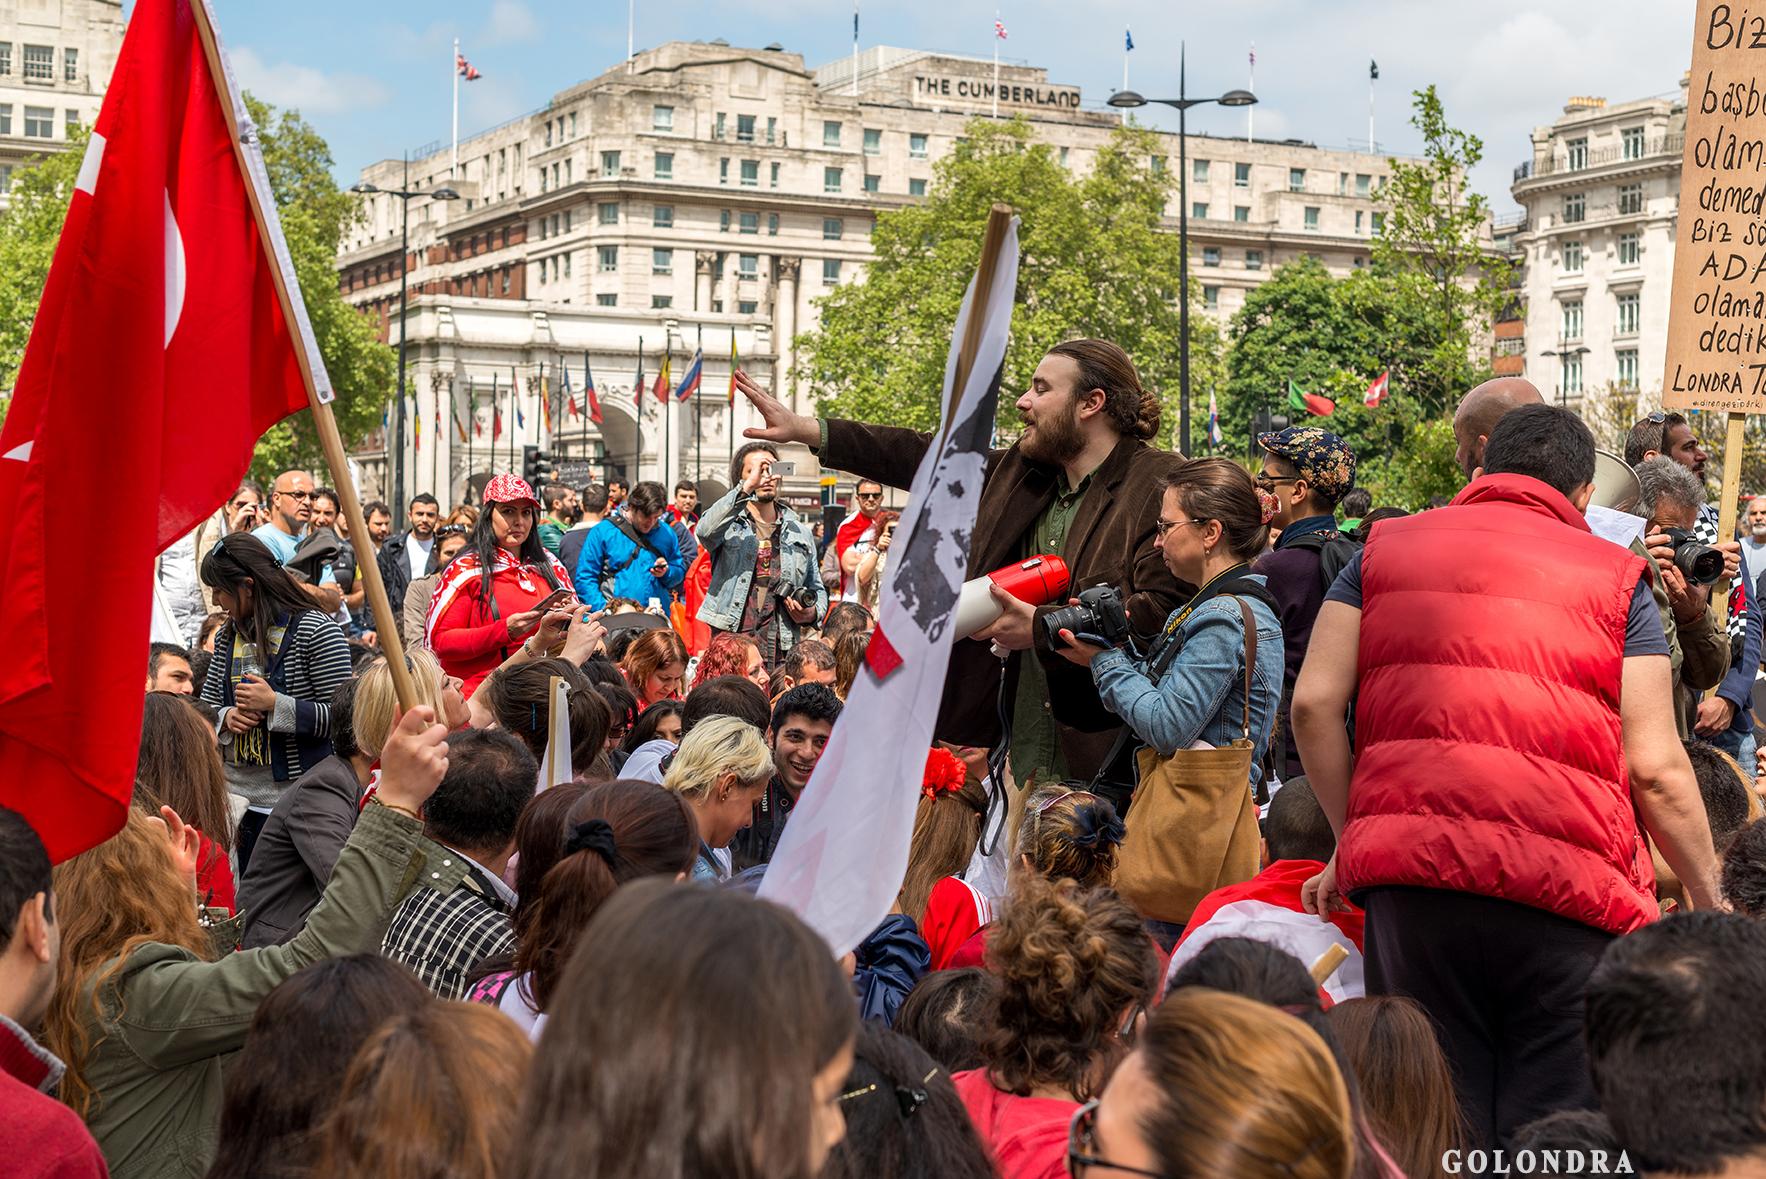 Protesting Turkish Government - Turk Hukumetini Protesto - Londra - London (23)